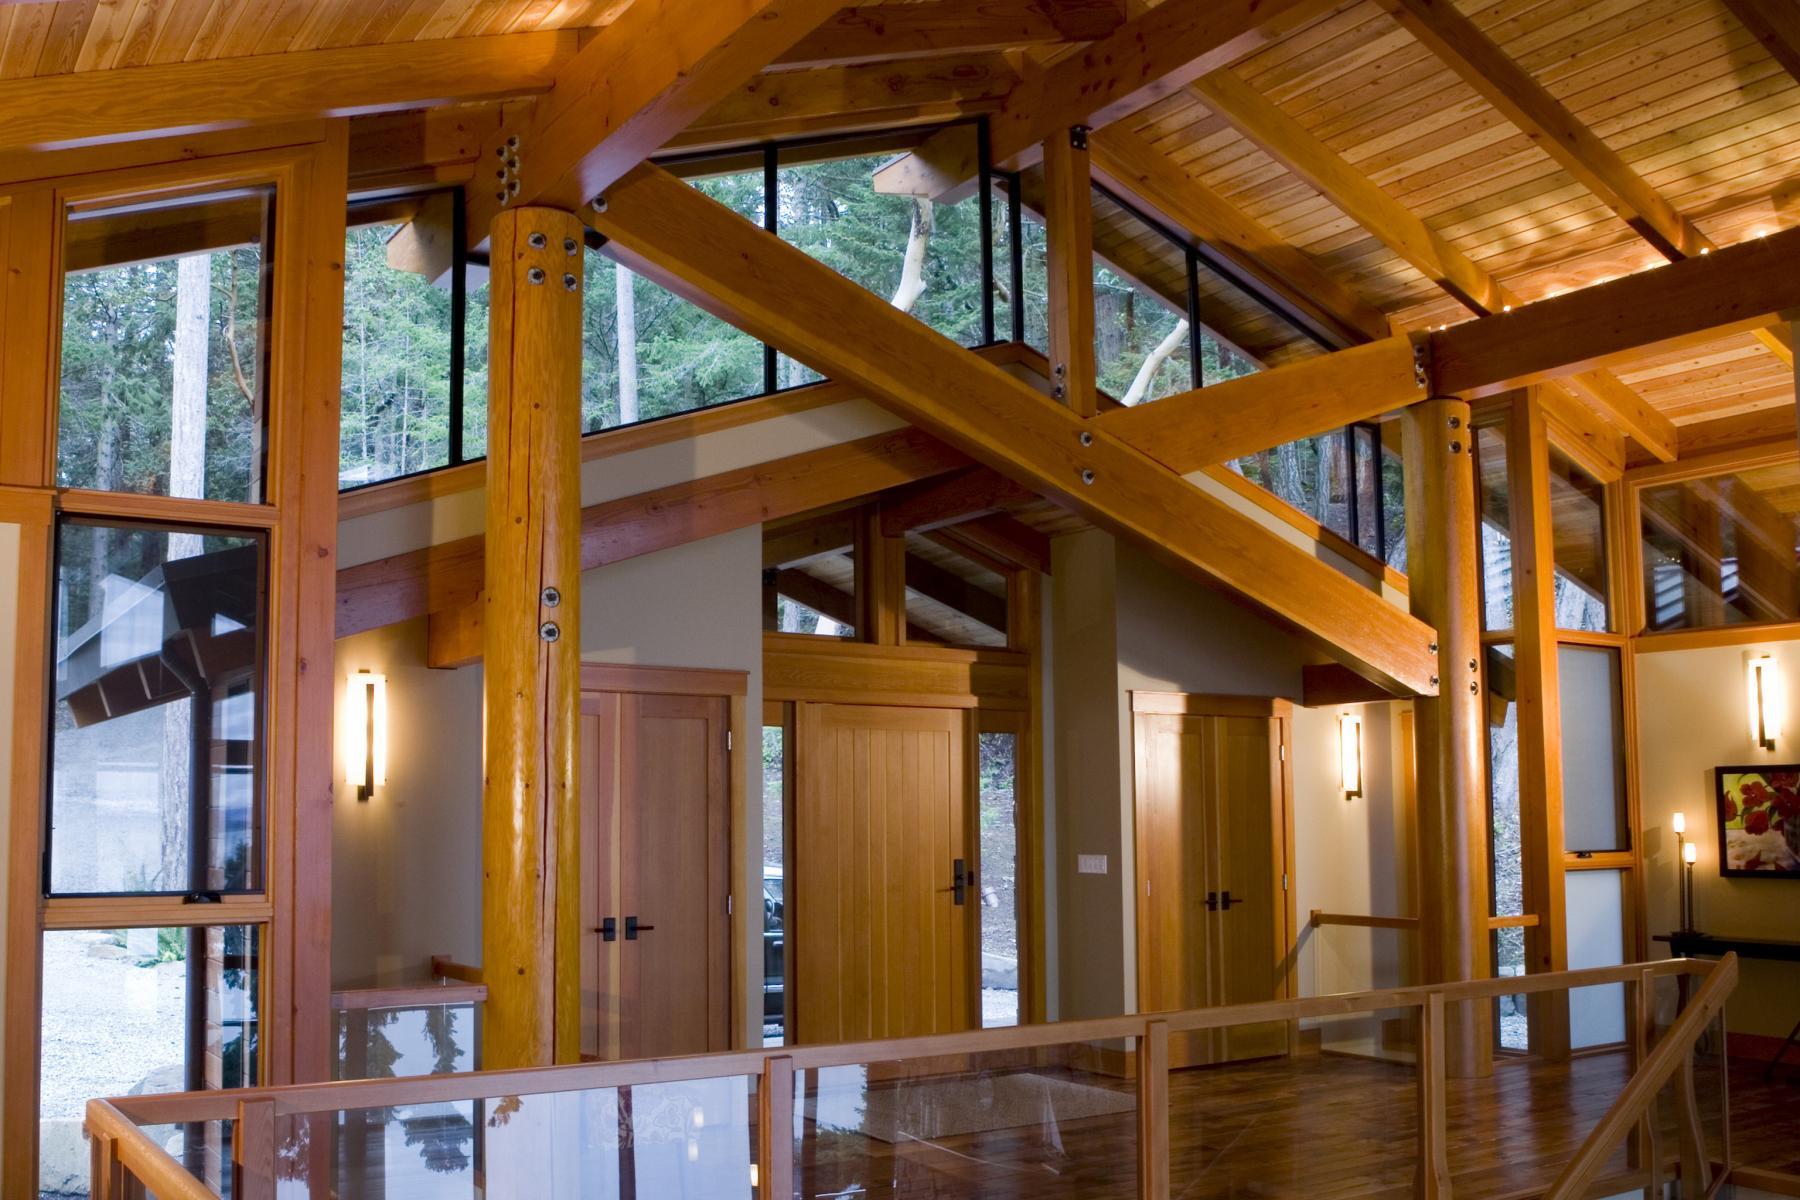 West Coast Home interior front door on Pender Island built by Dave Dandeneau of Gulf Islands Artisan Homes